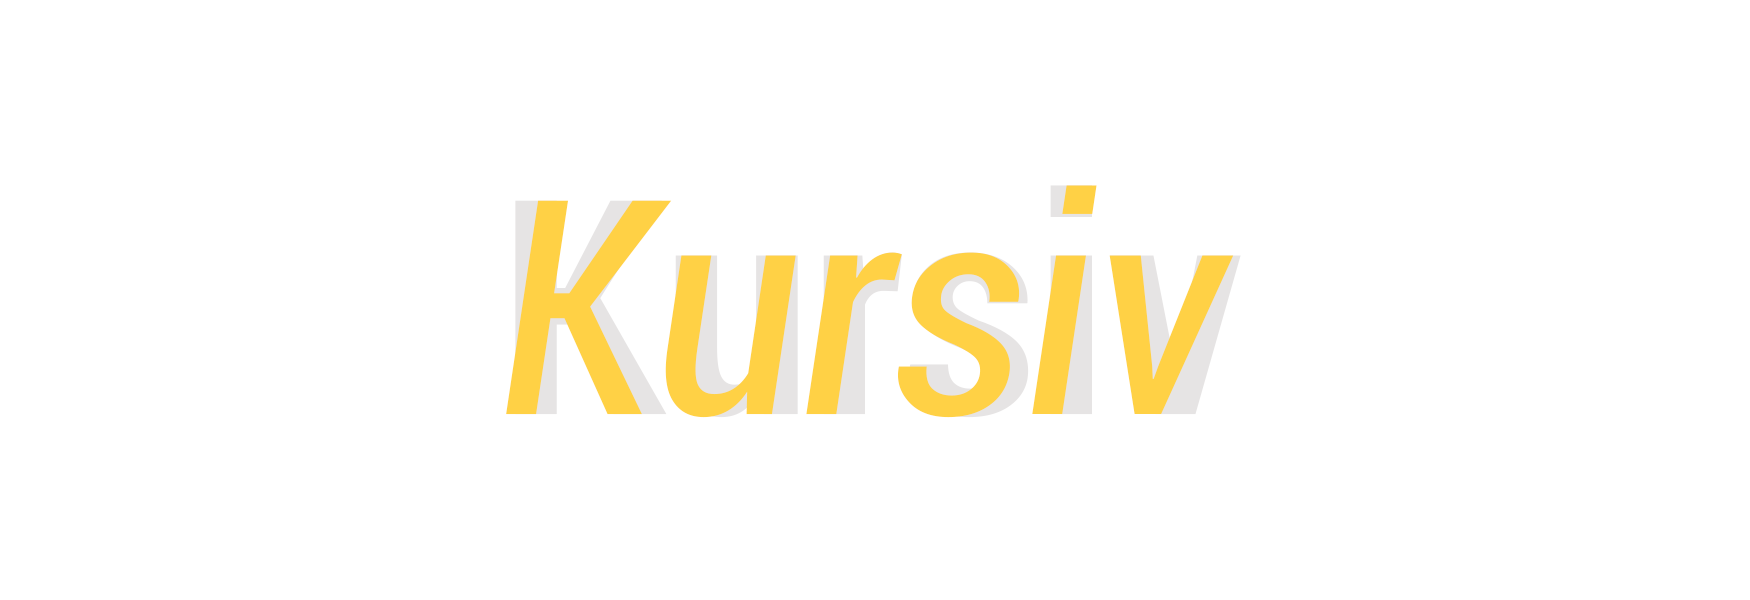 Designagentur-Stuttgart-Kreativbetrieb-Design-Lexikon-Kursiv-1